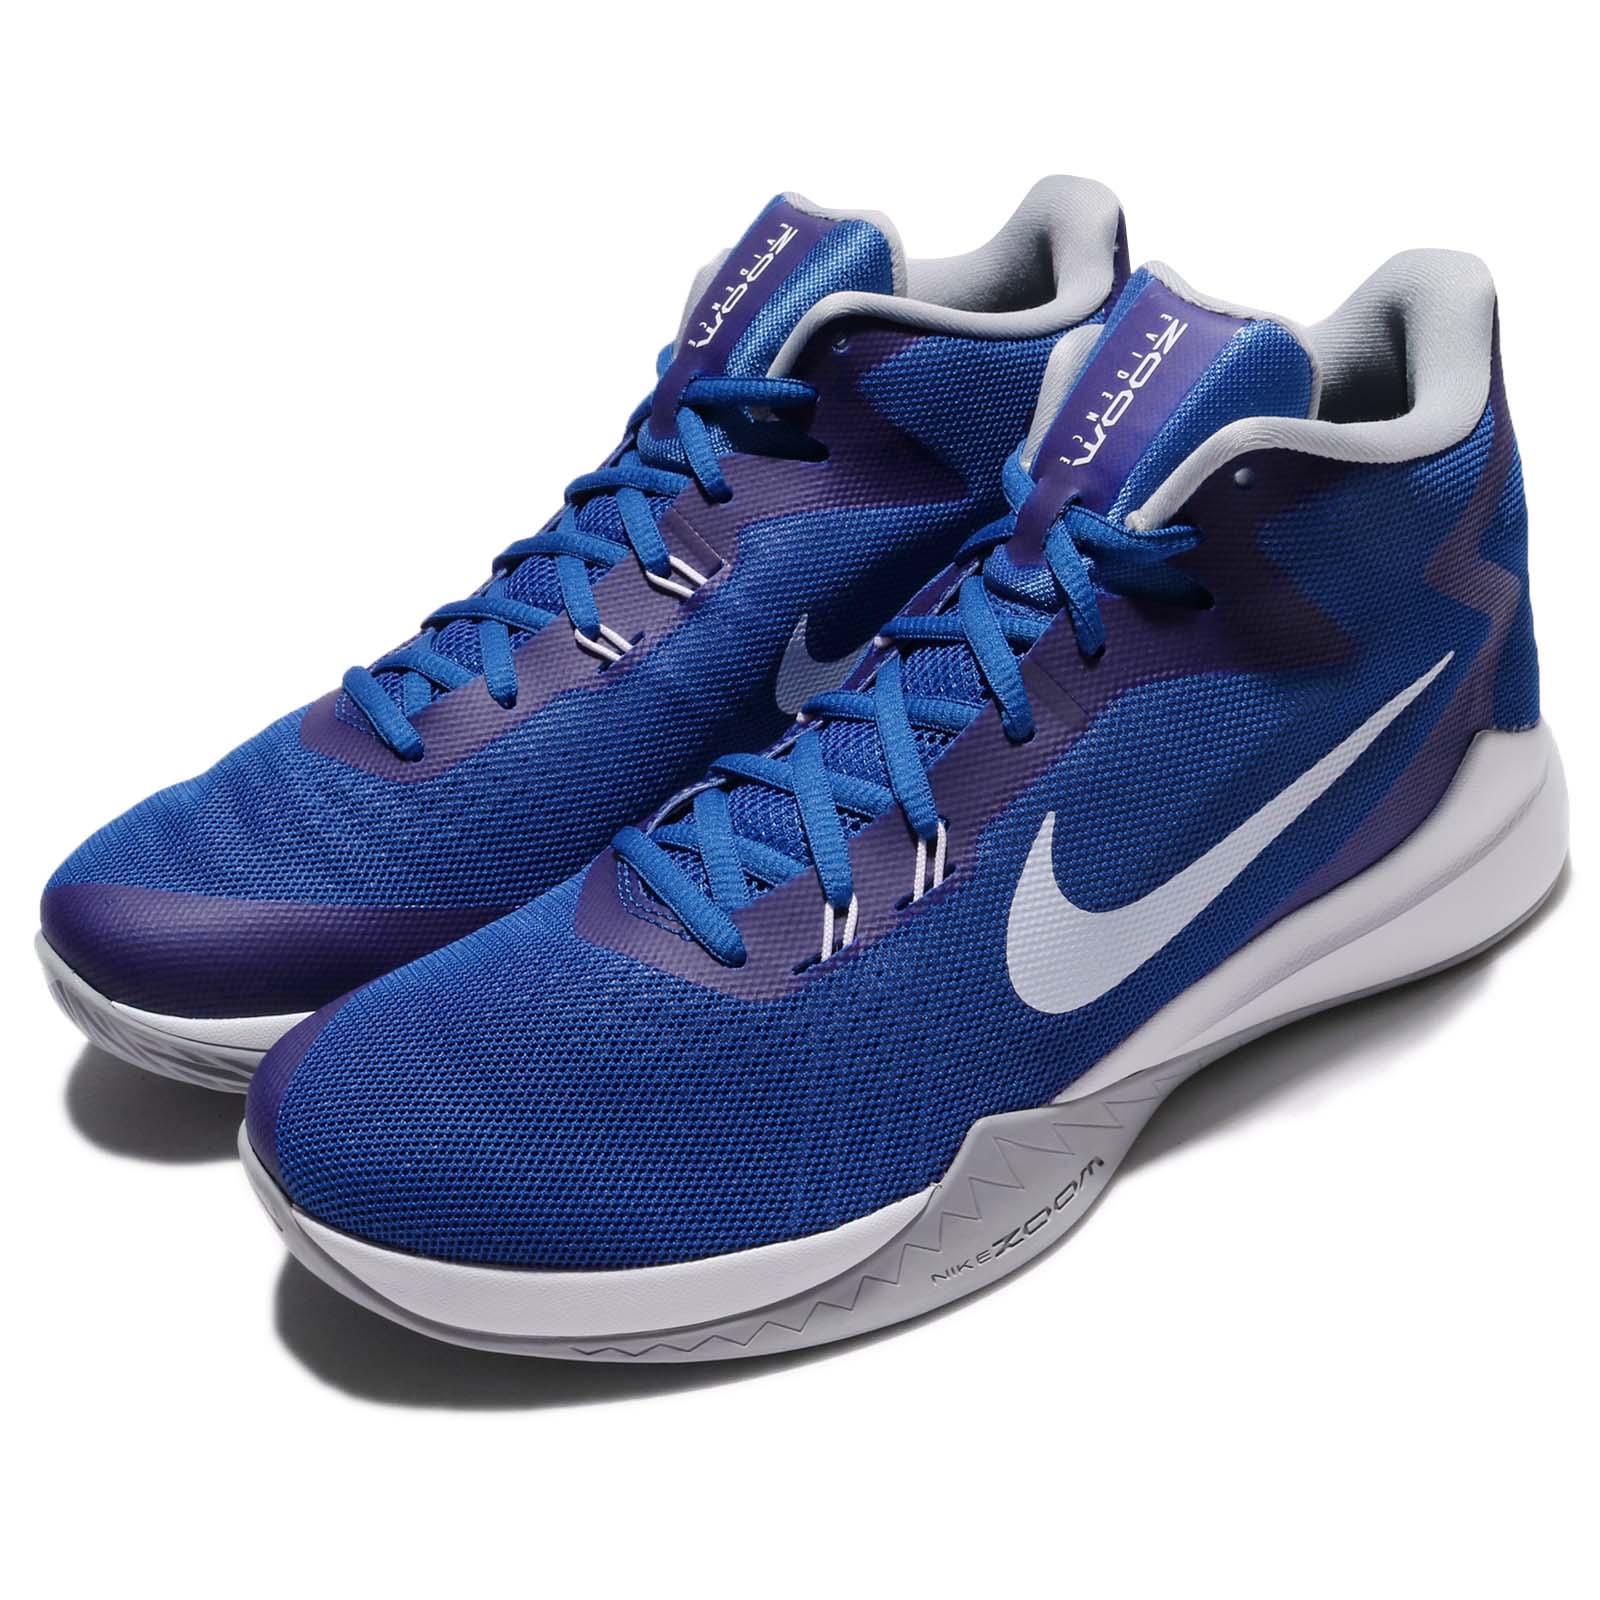 Nike 籃球鞋 Zoom Evidence 男鞋 852464-401